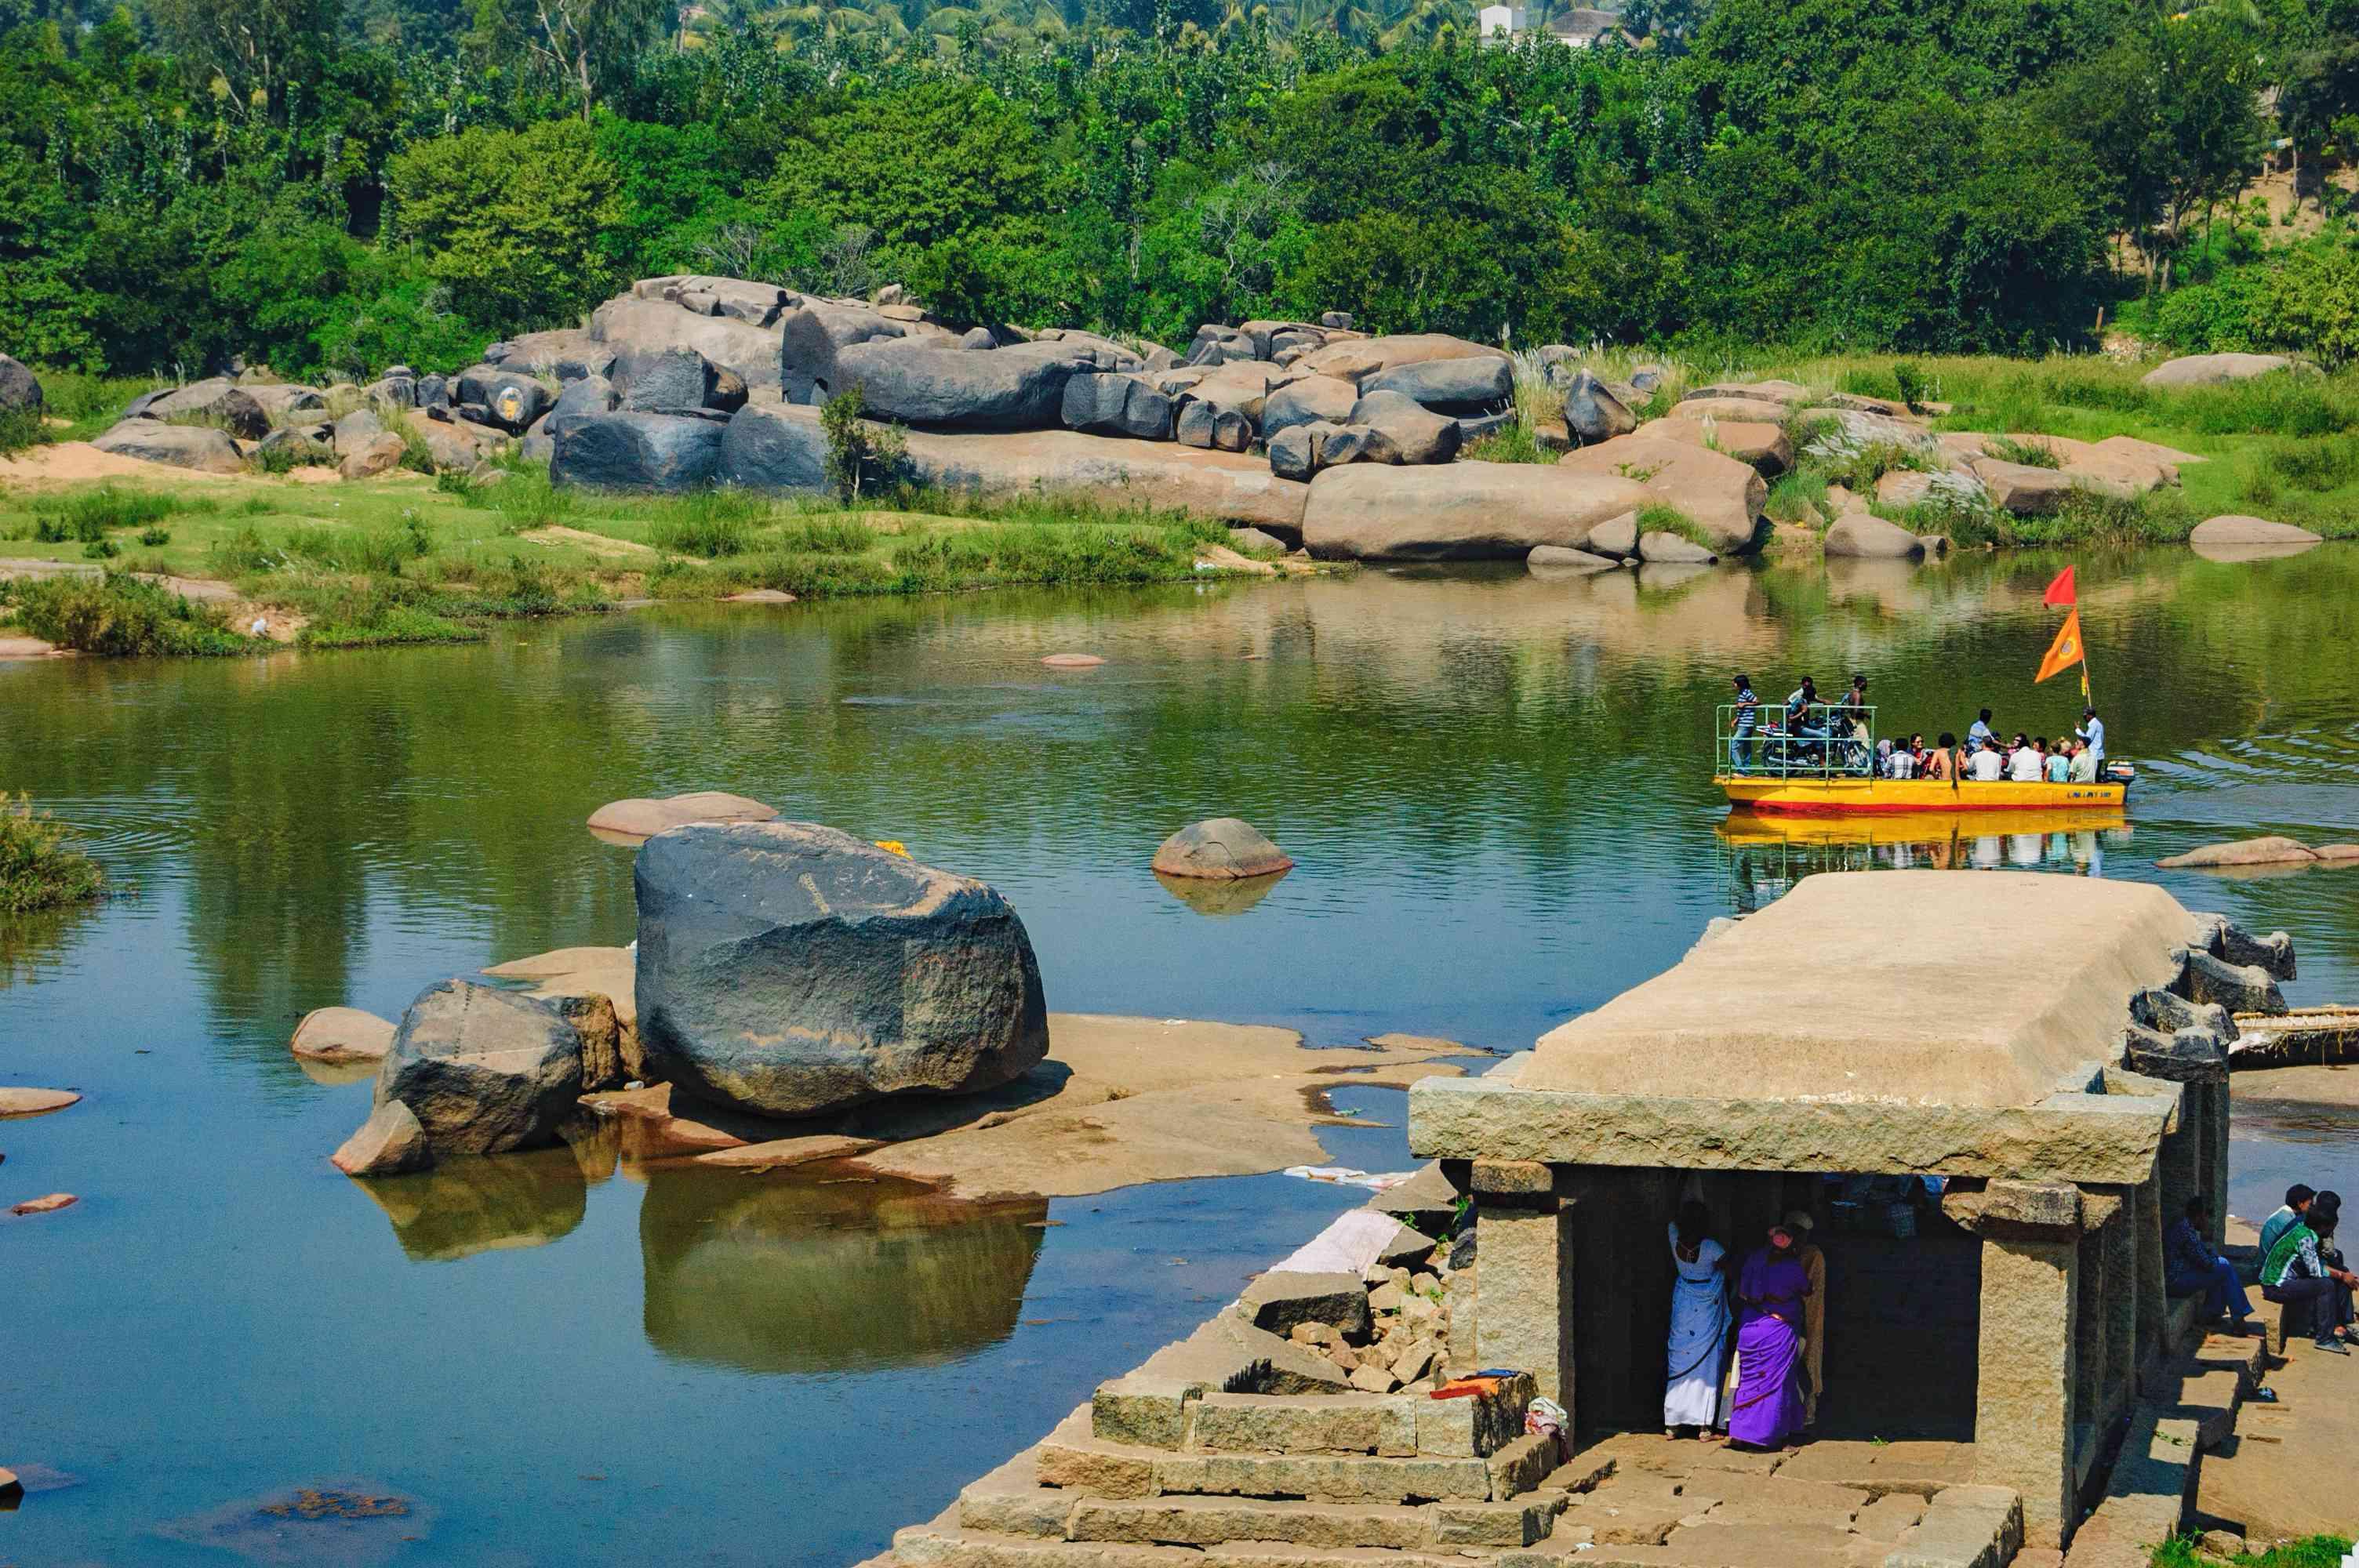 Crossing the Tungabhadra River in Hampi